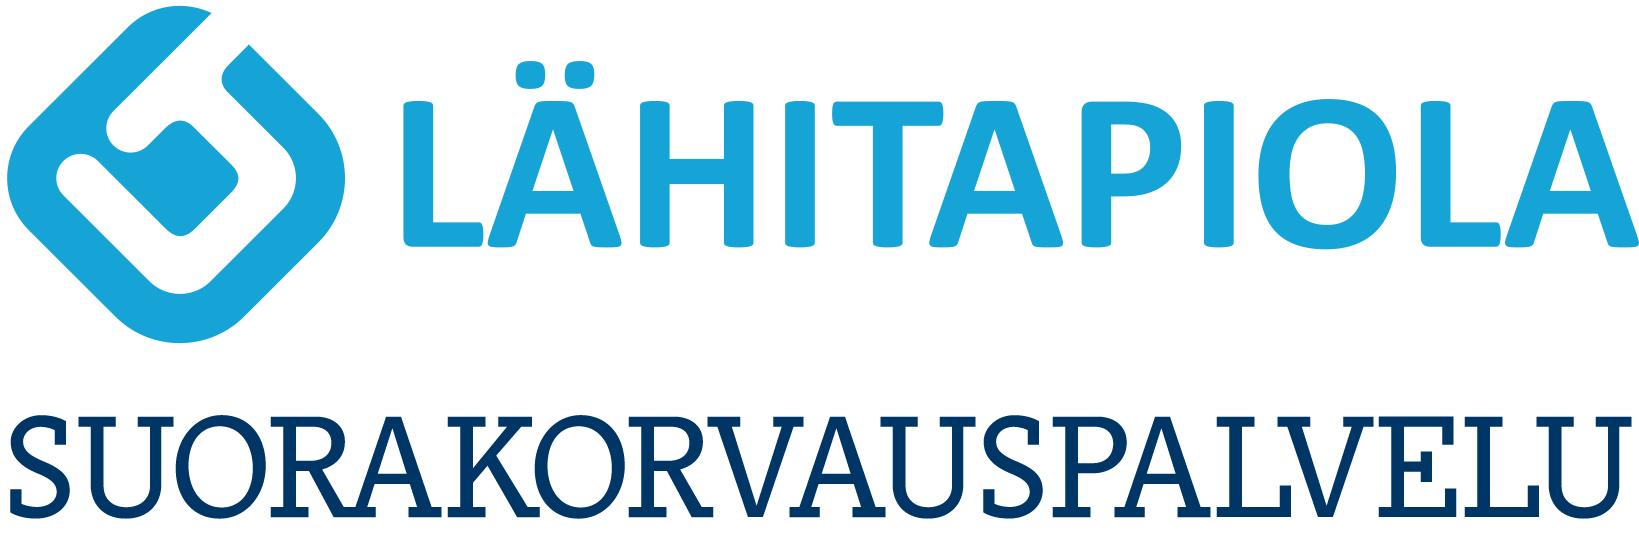 Lahitapiola_suorakorvauspalvelu_sininen logo